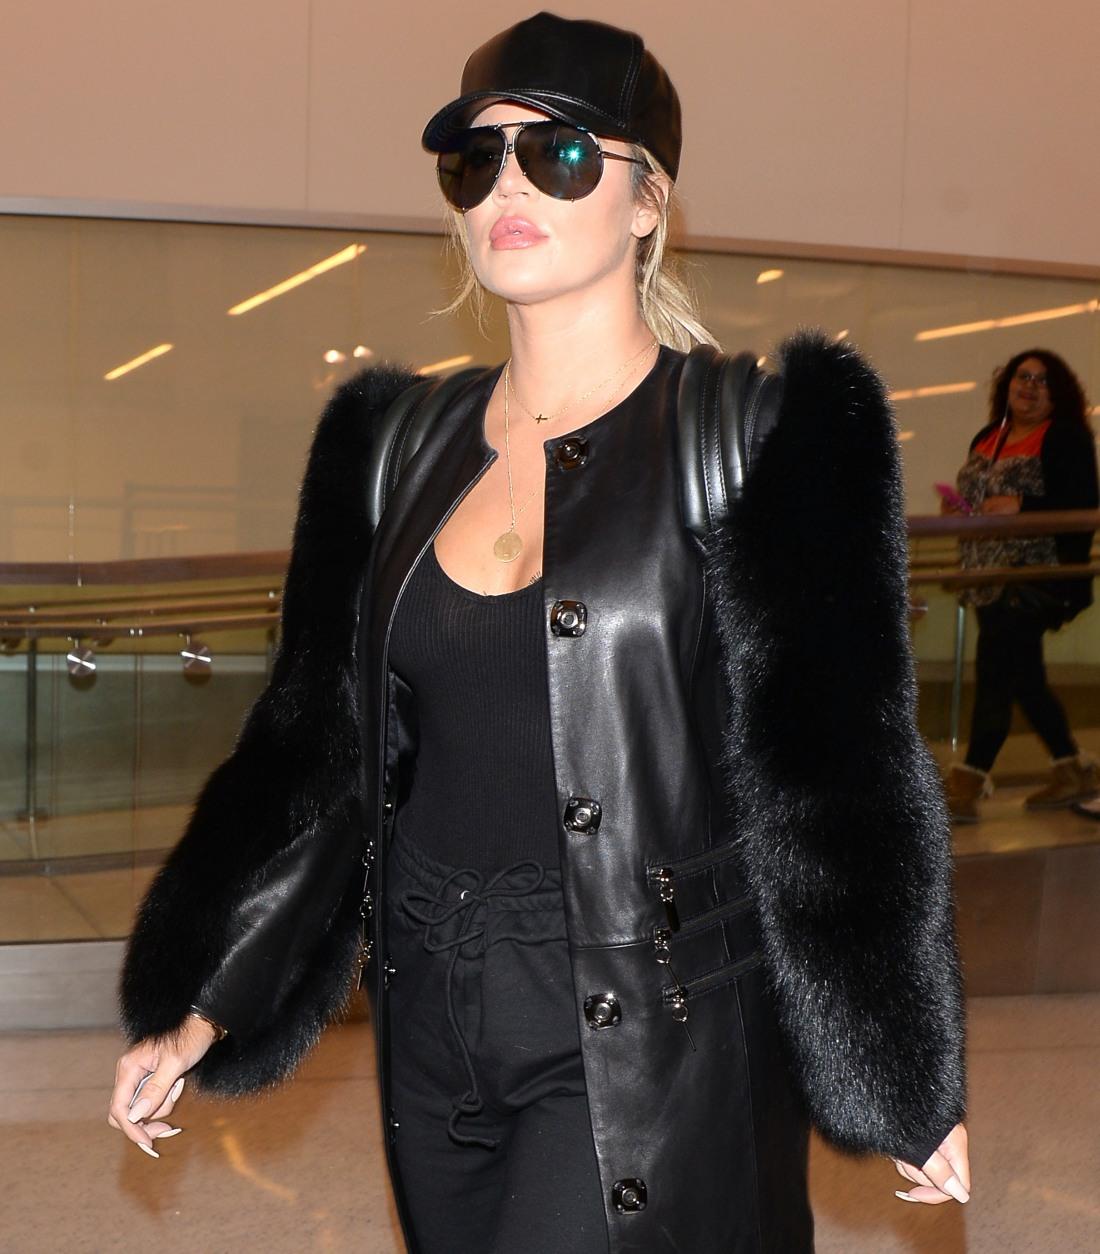 Khloe Kardashian Departs From LAX